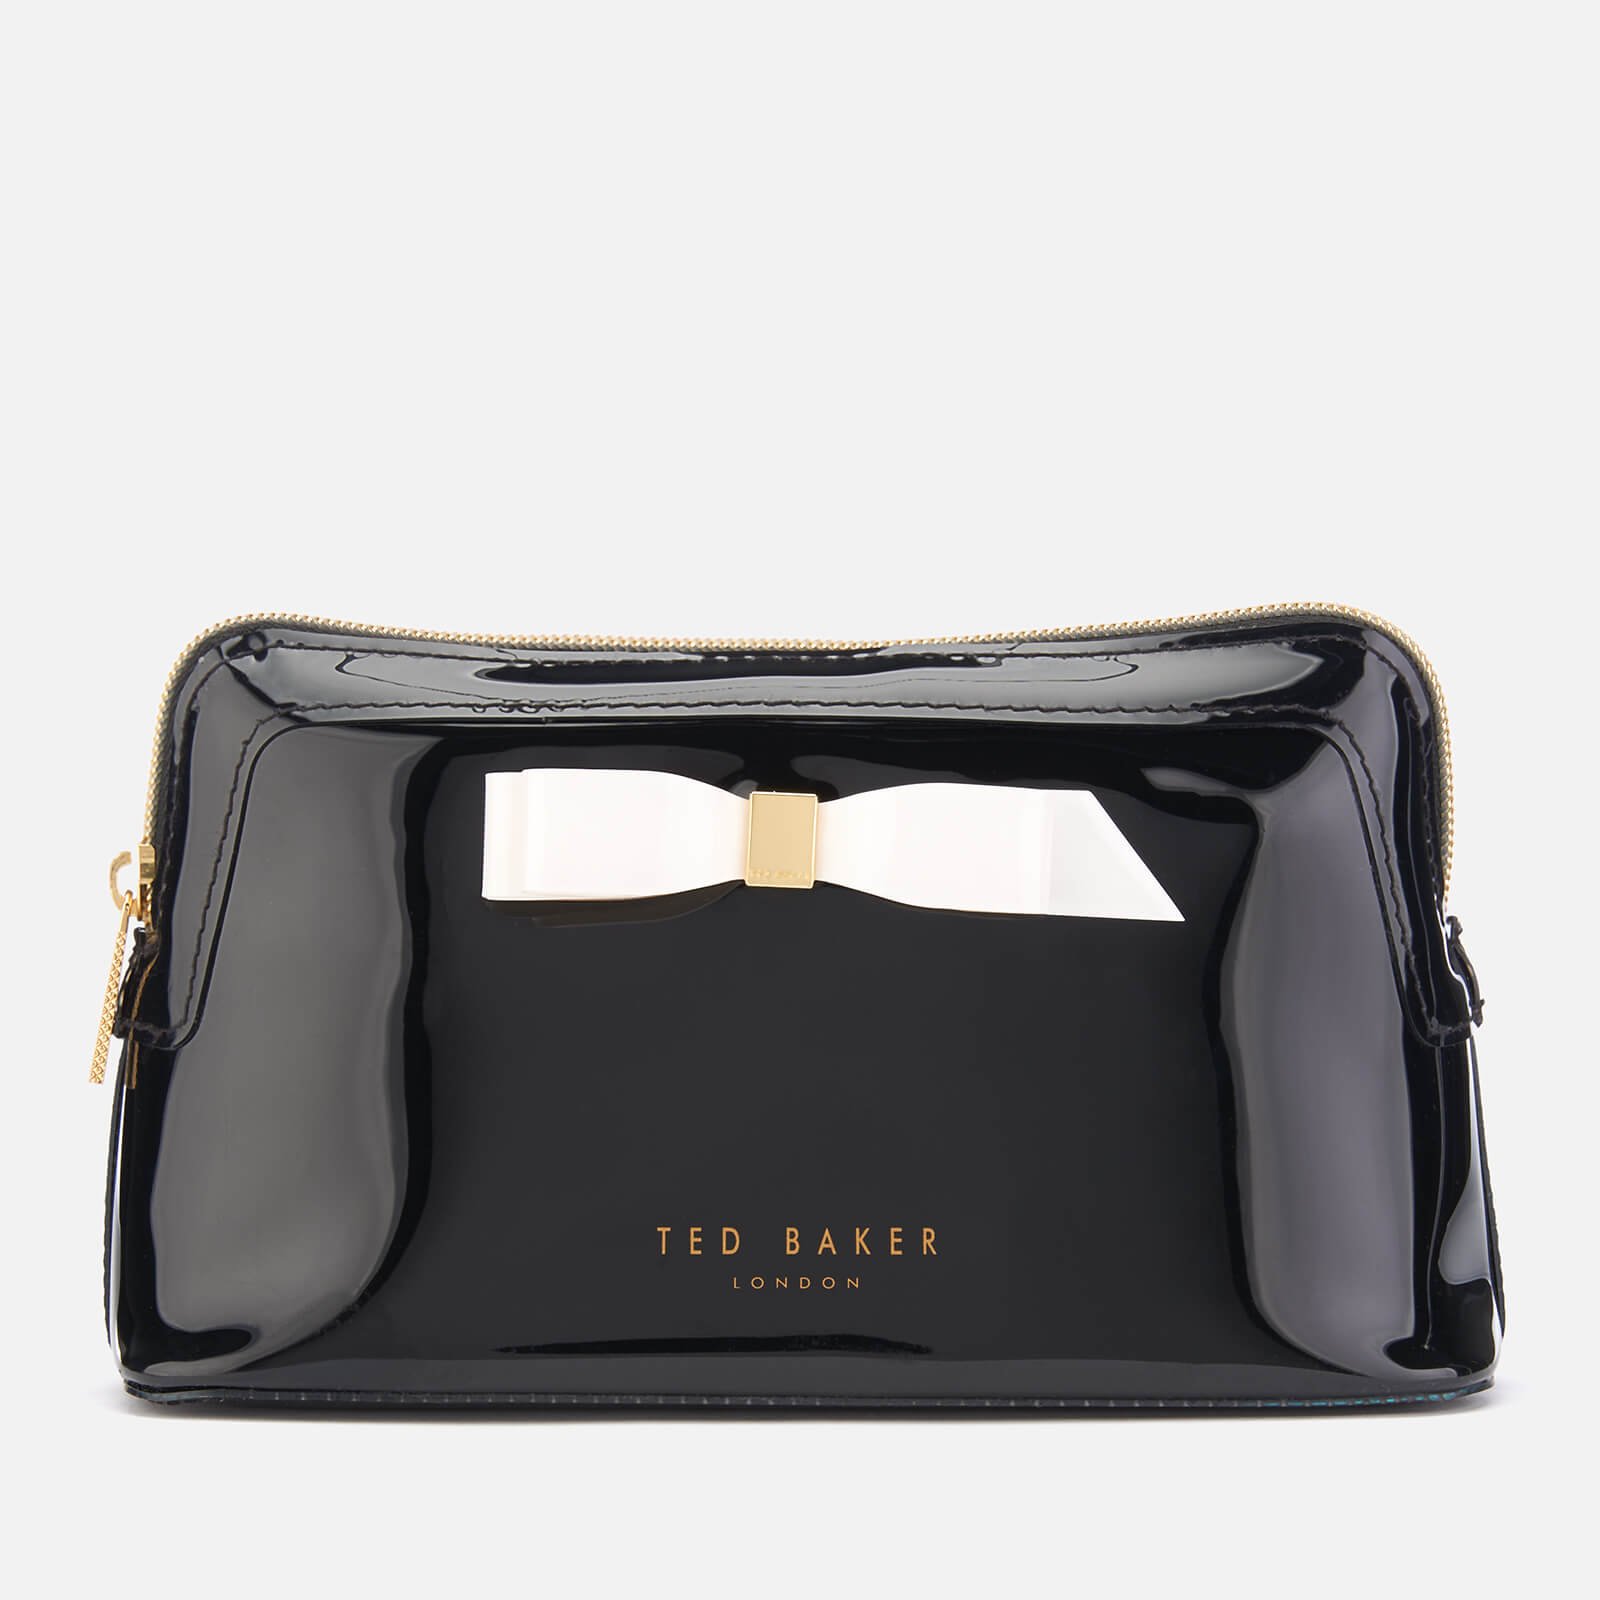 0182e3f534 Ted Baker Women's Cahira Bow Makeup Bag - Black Womens Accessories    TheHut.com